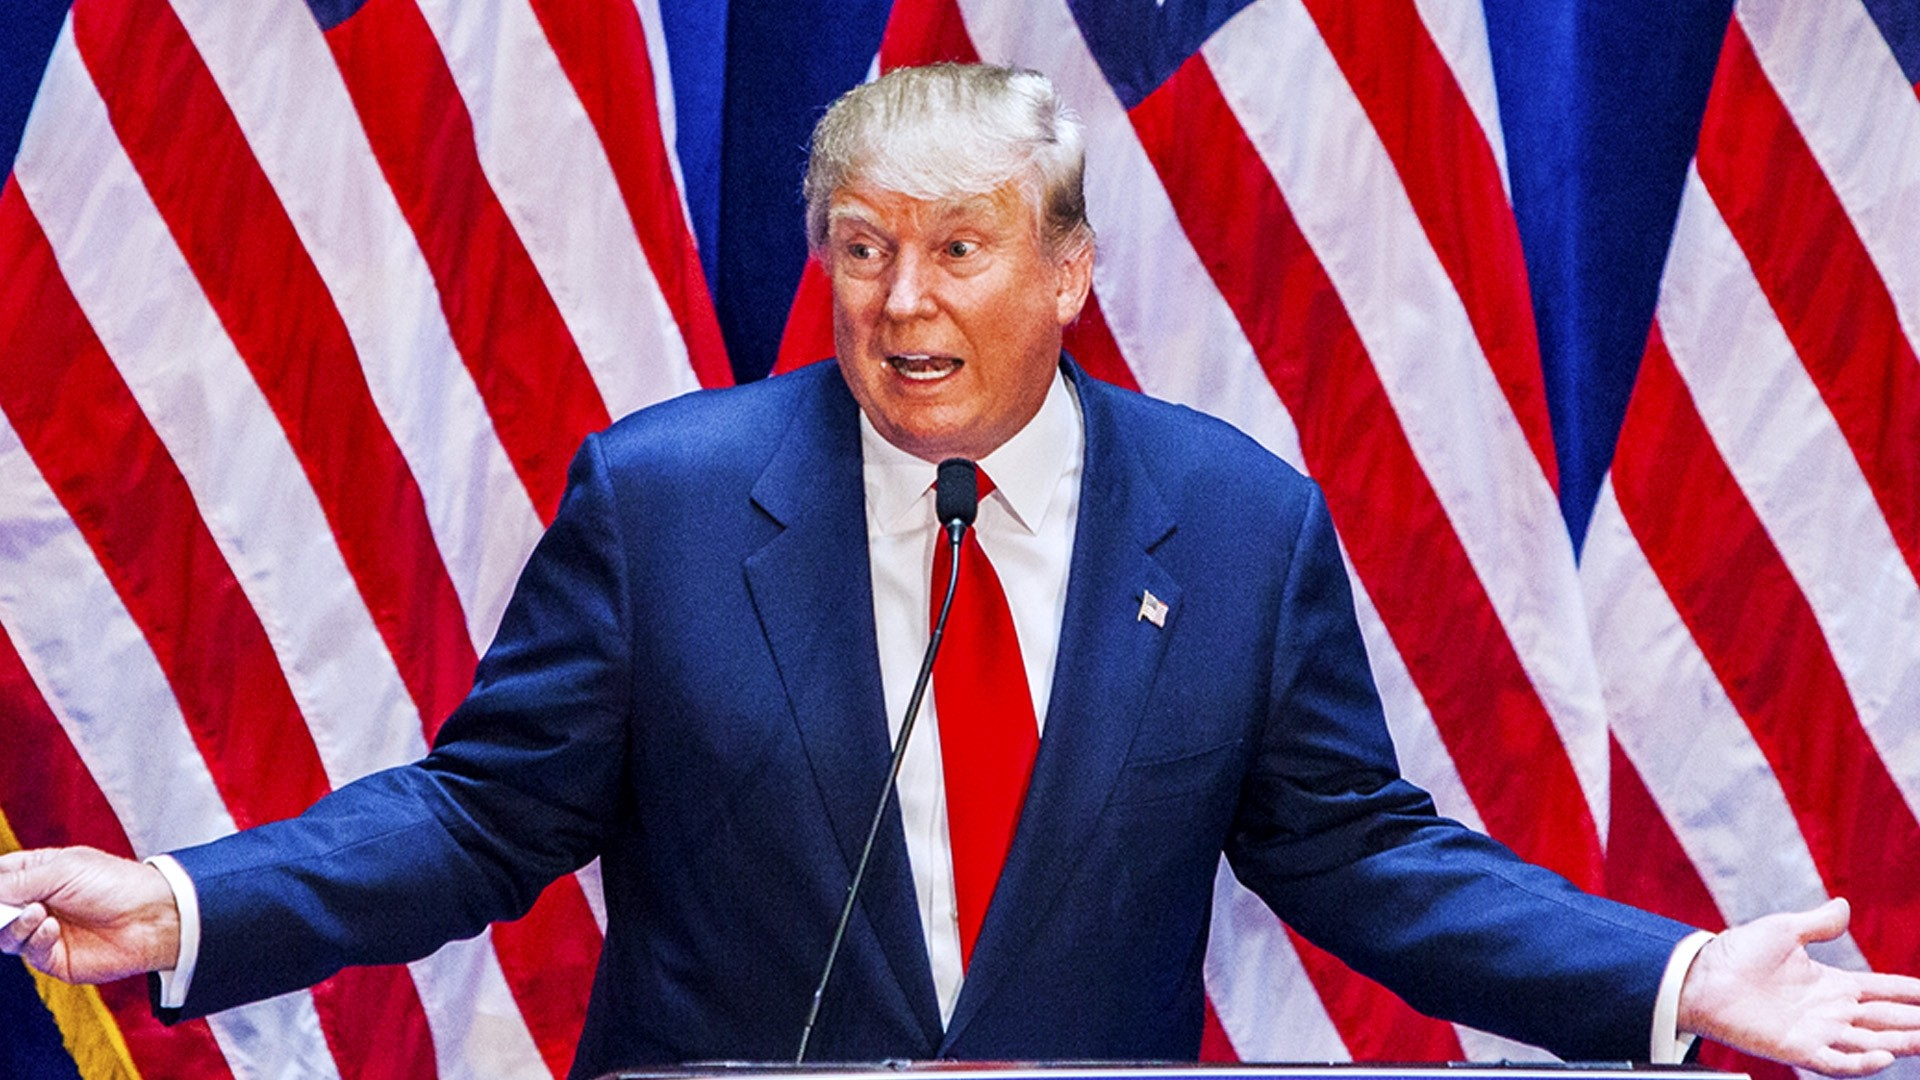 Donald Trump Pic